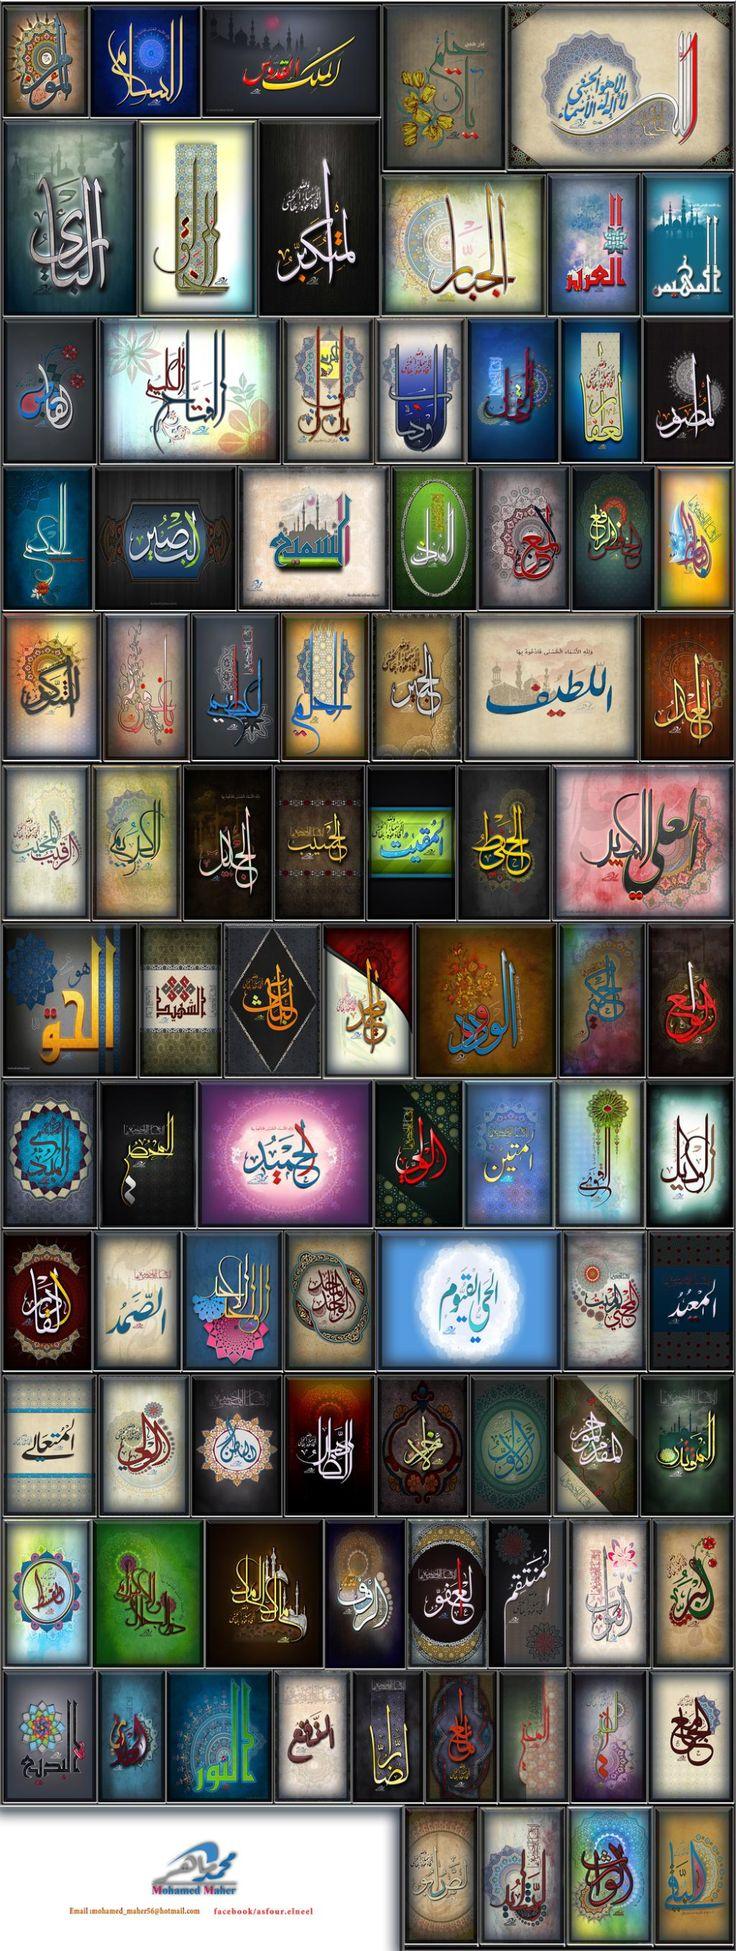 99 Names of God by AsfourElneel on DeviantArt Seni